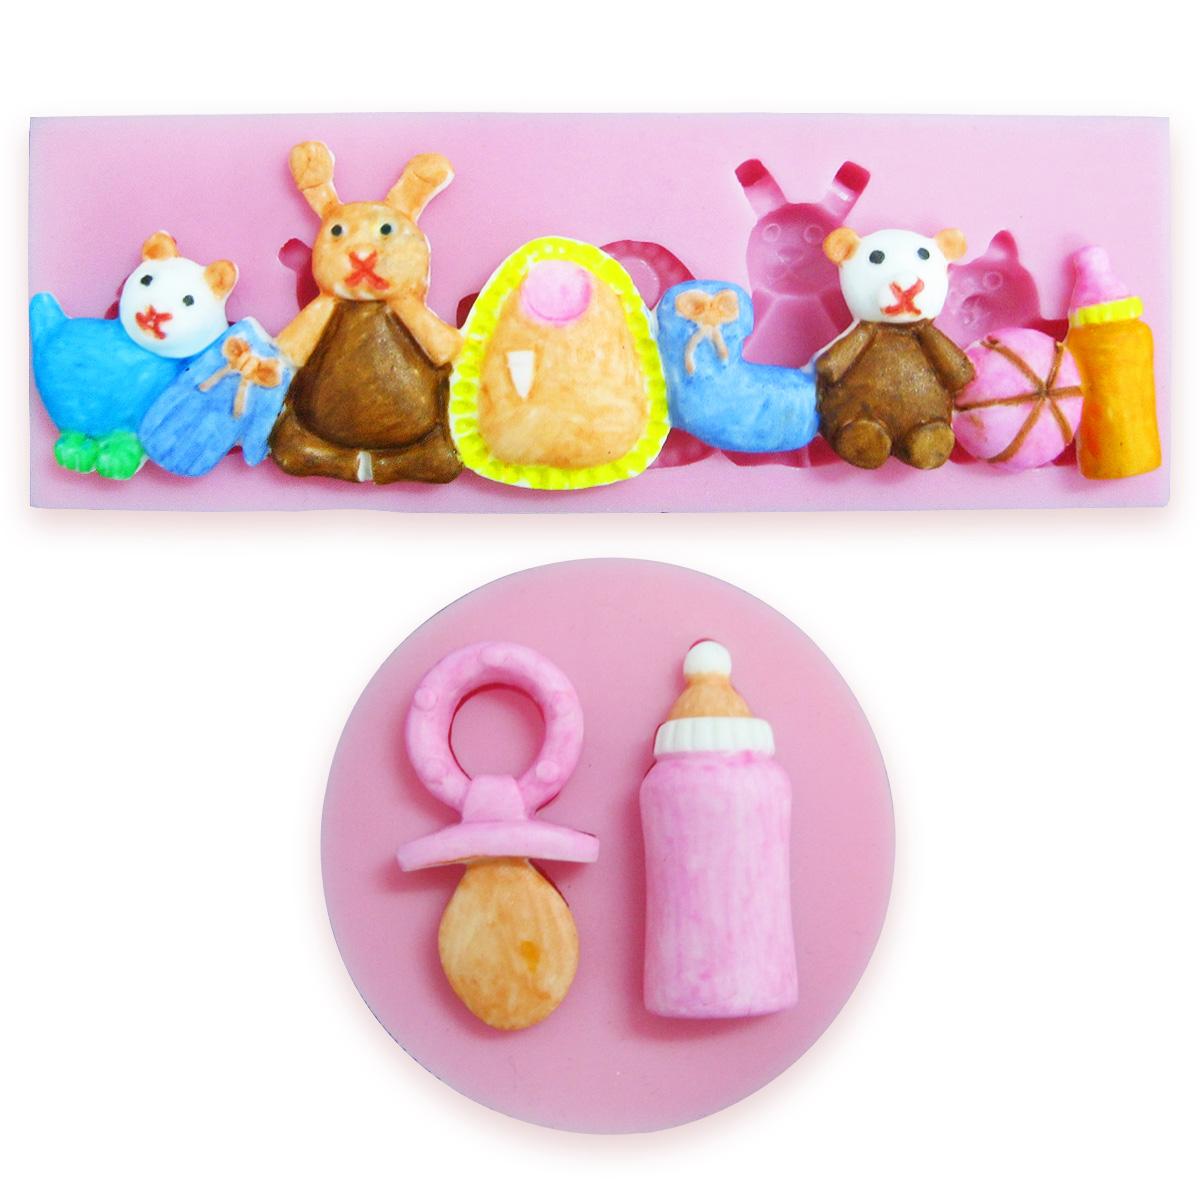 Birthday baby elf silicone cake fondant mold sugarcraft for Sugar craft decorations